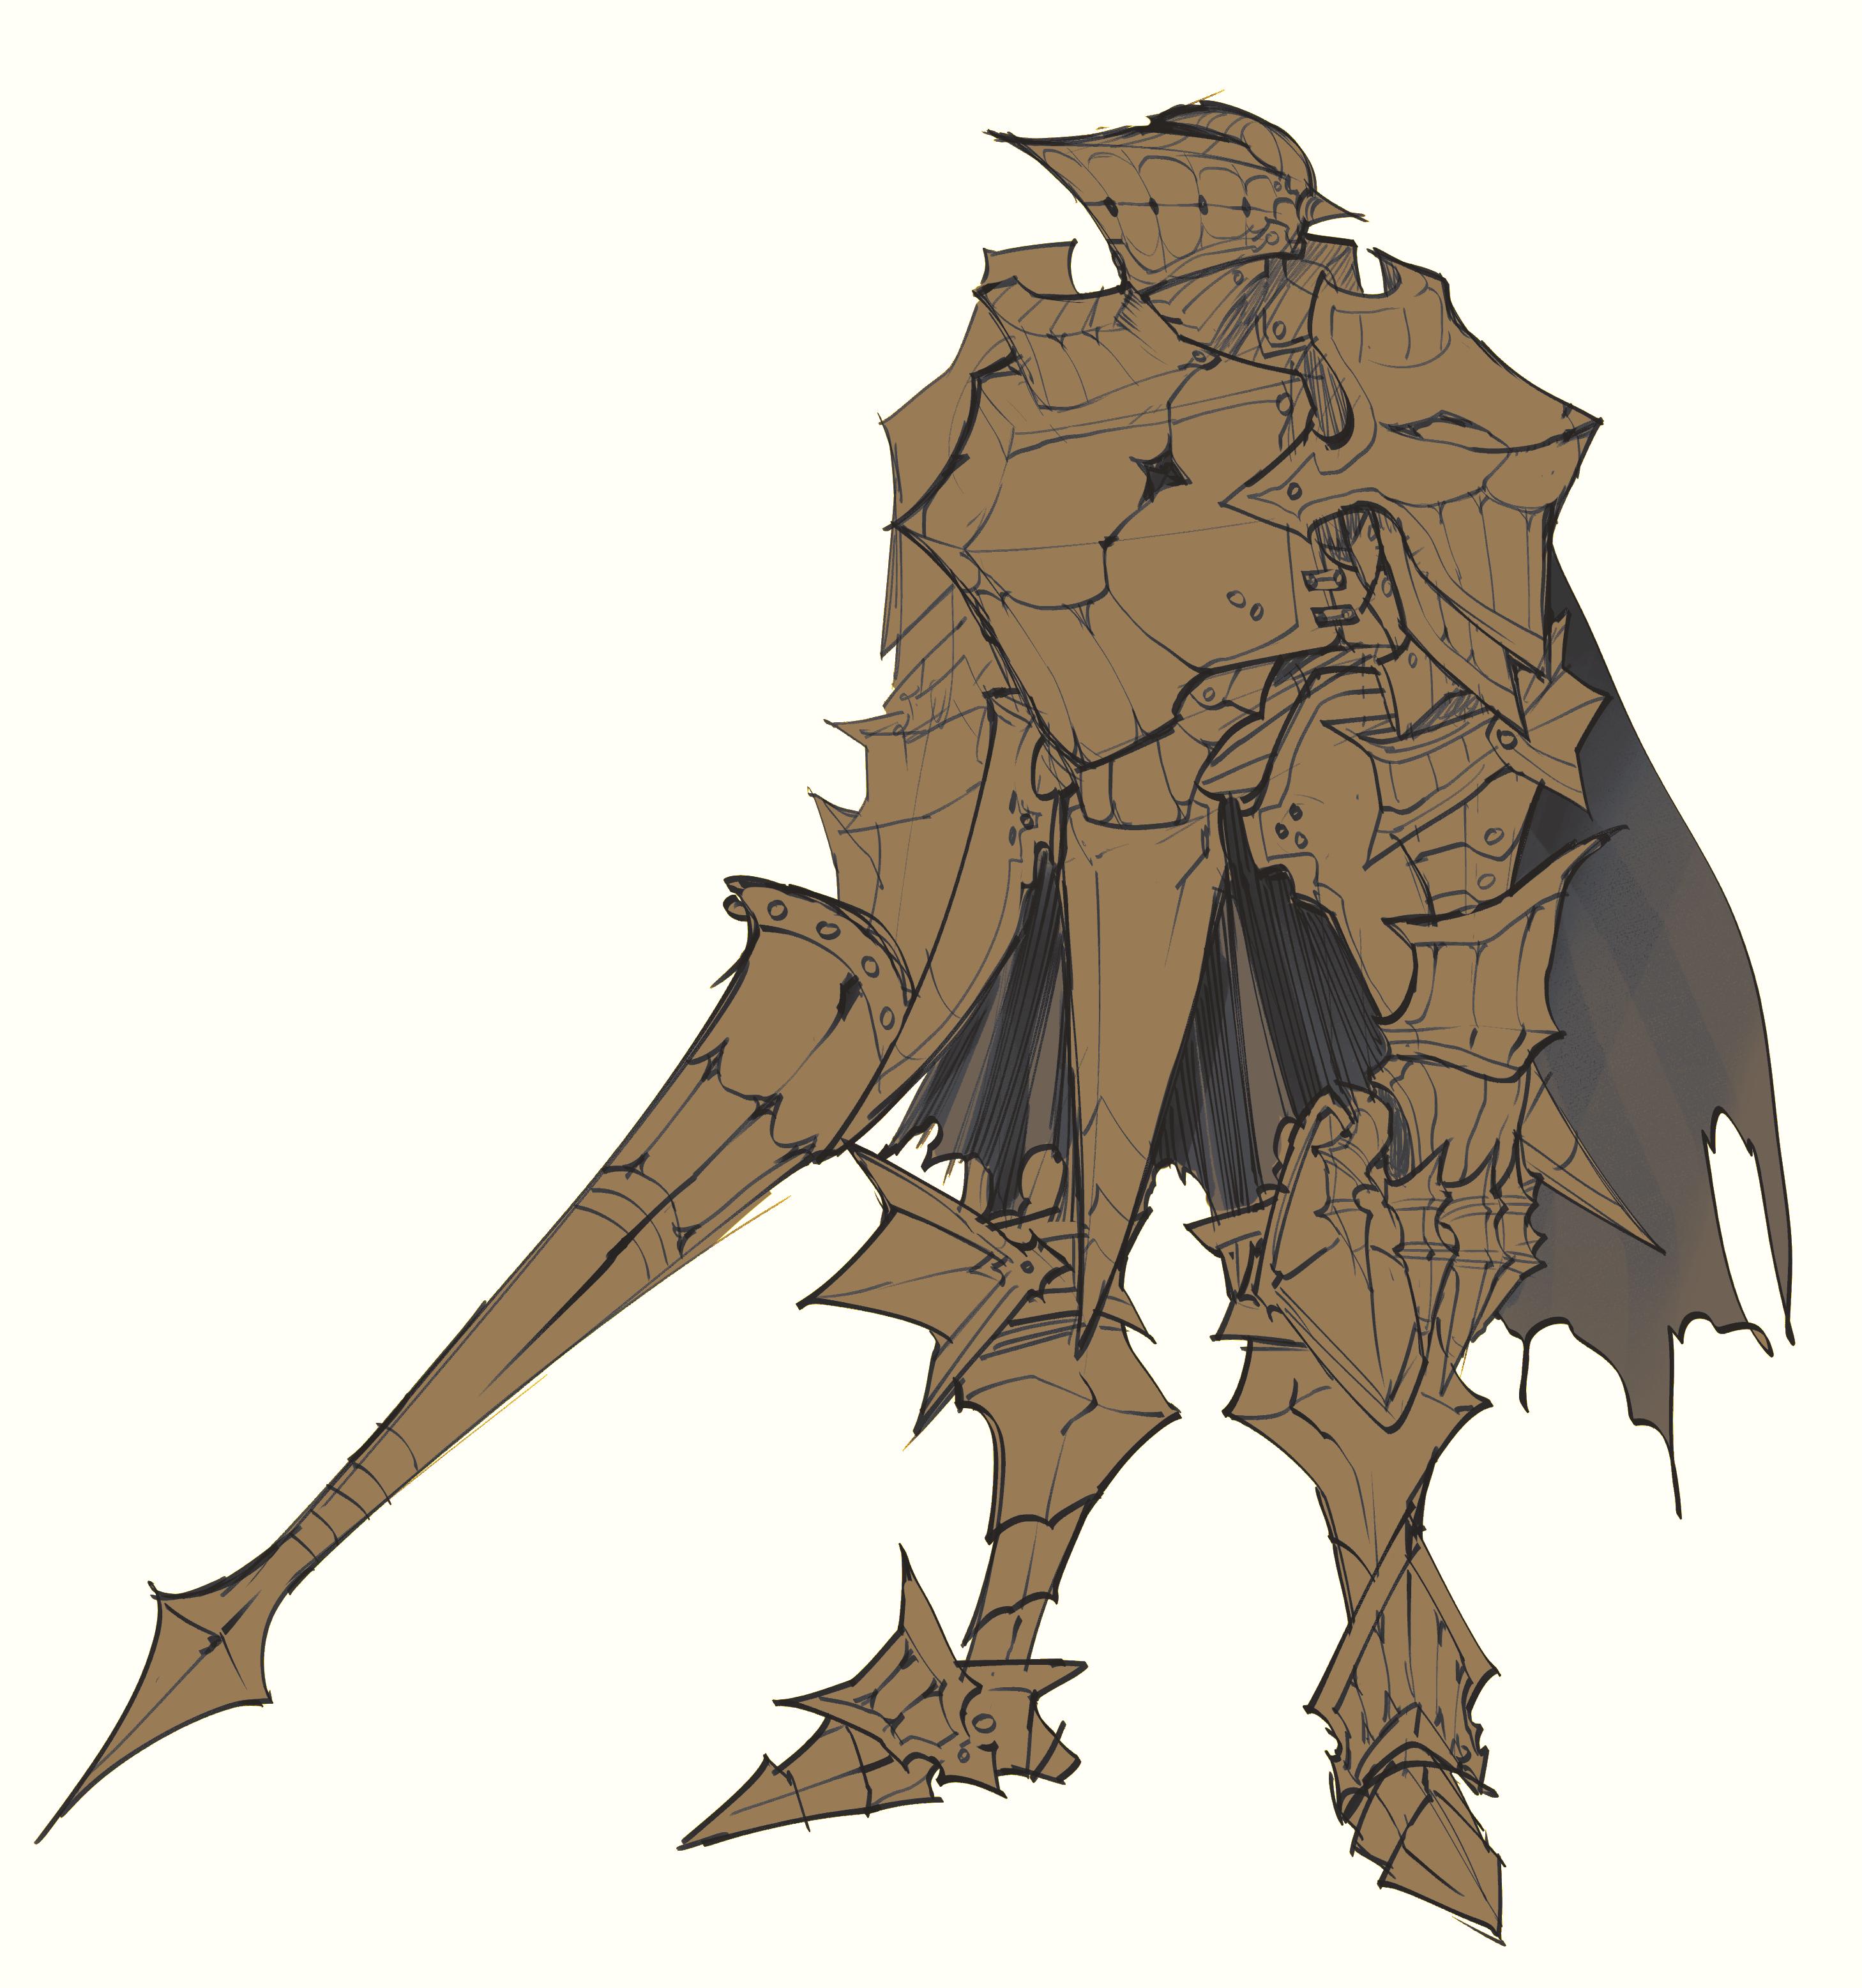 Grinning Knight